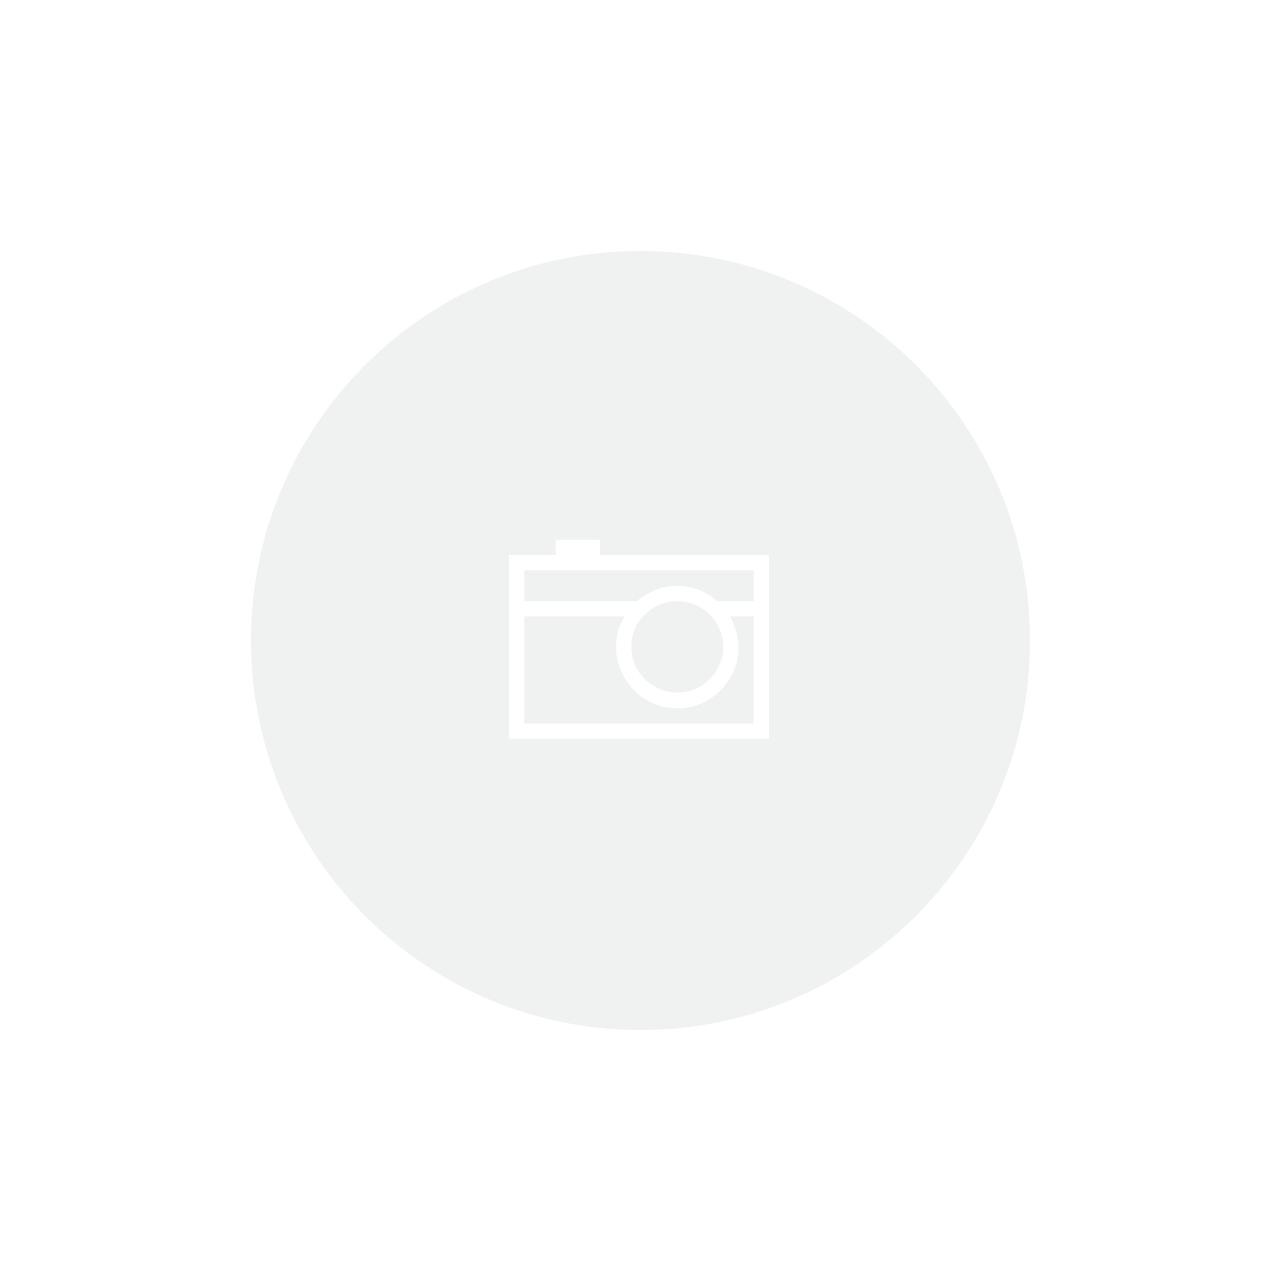 Assadeira Redonda em Alumínio e Starflon ø22cm Bakery Tramon